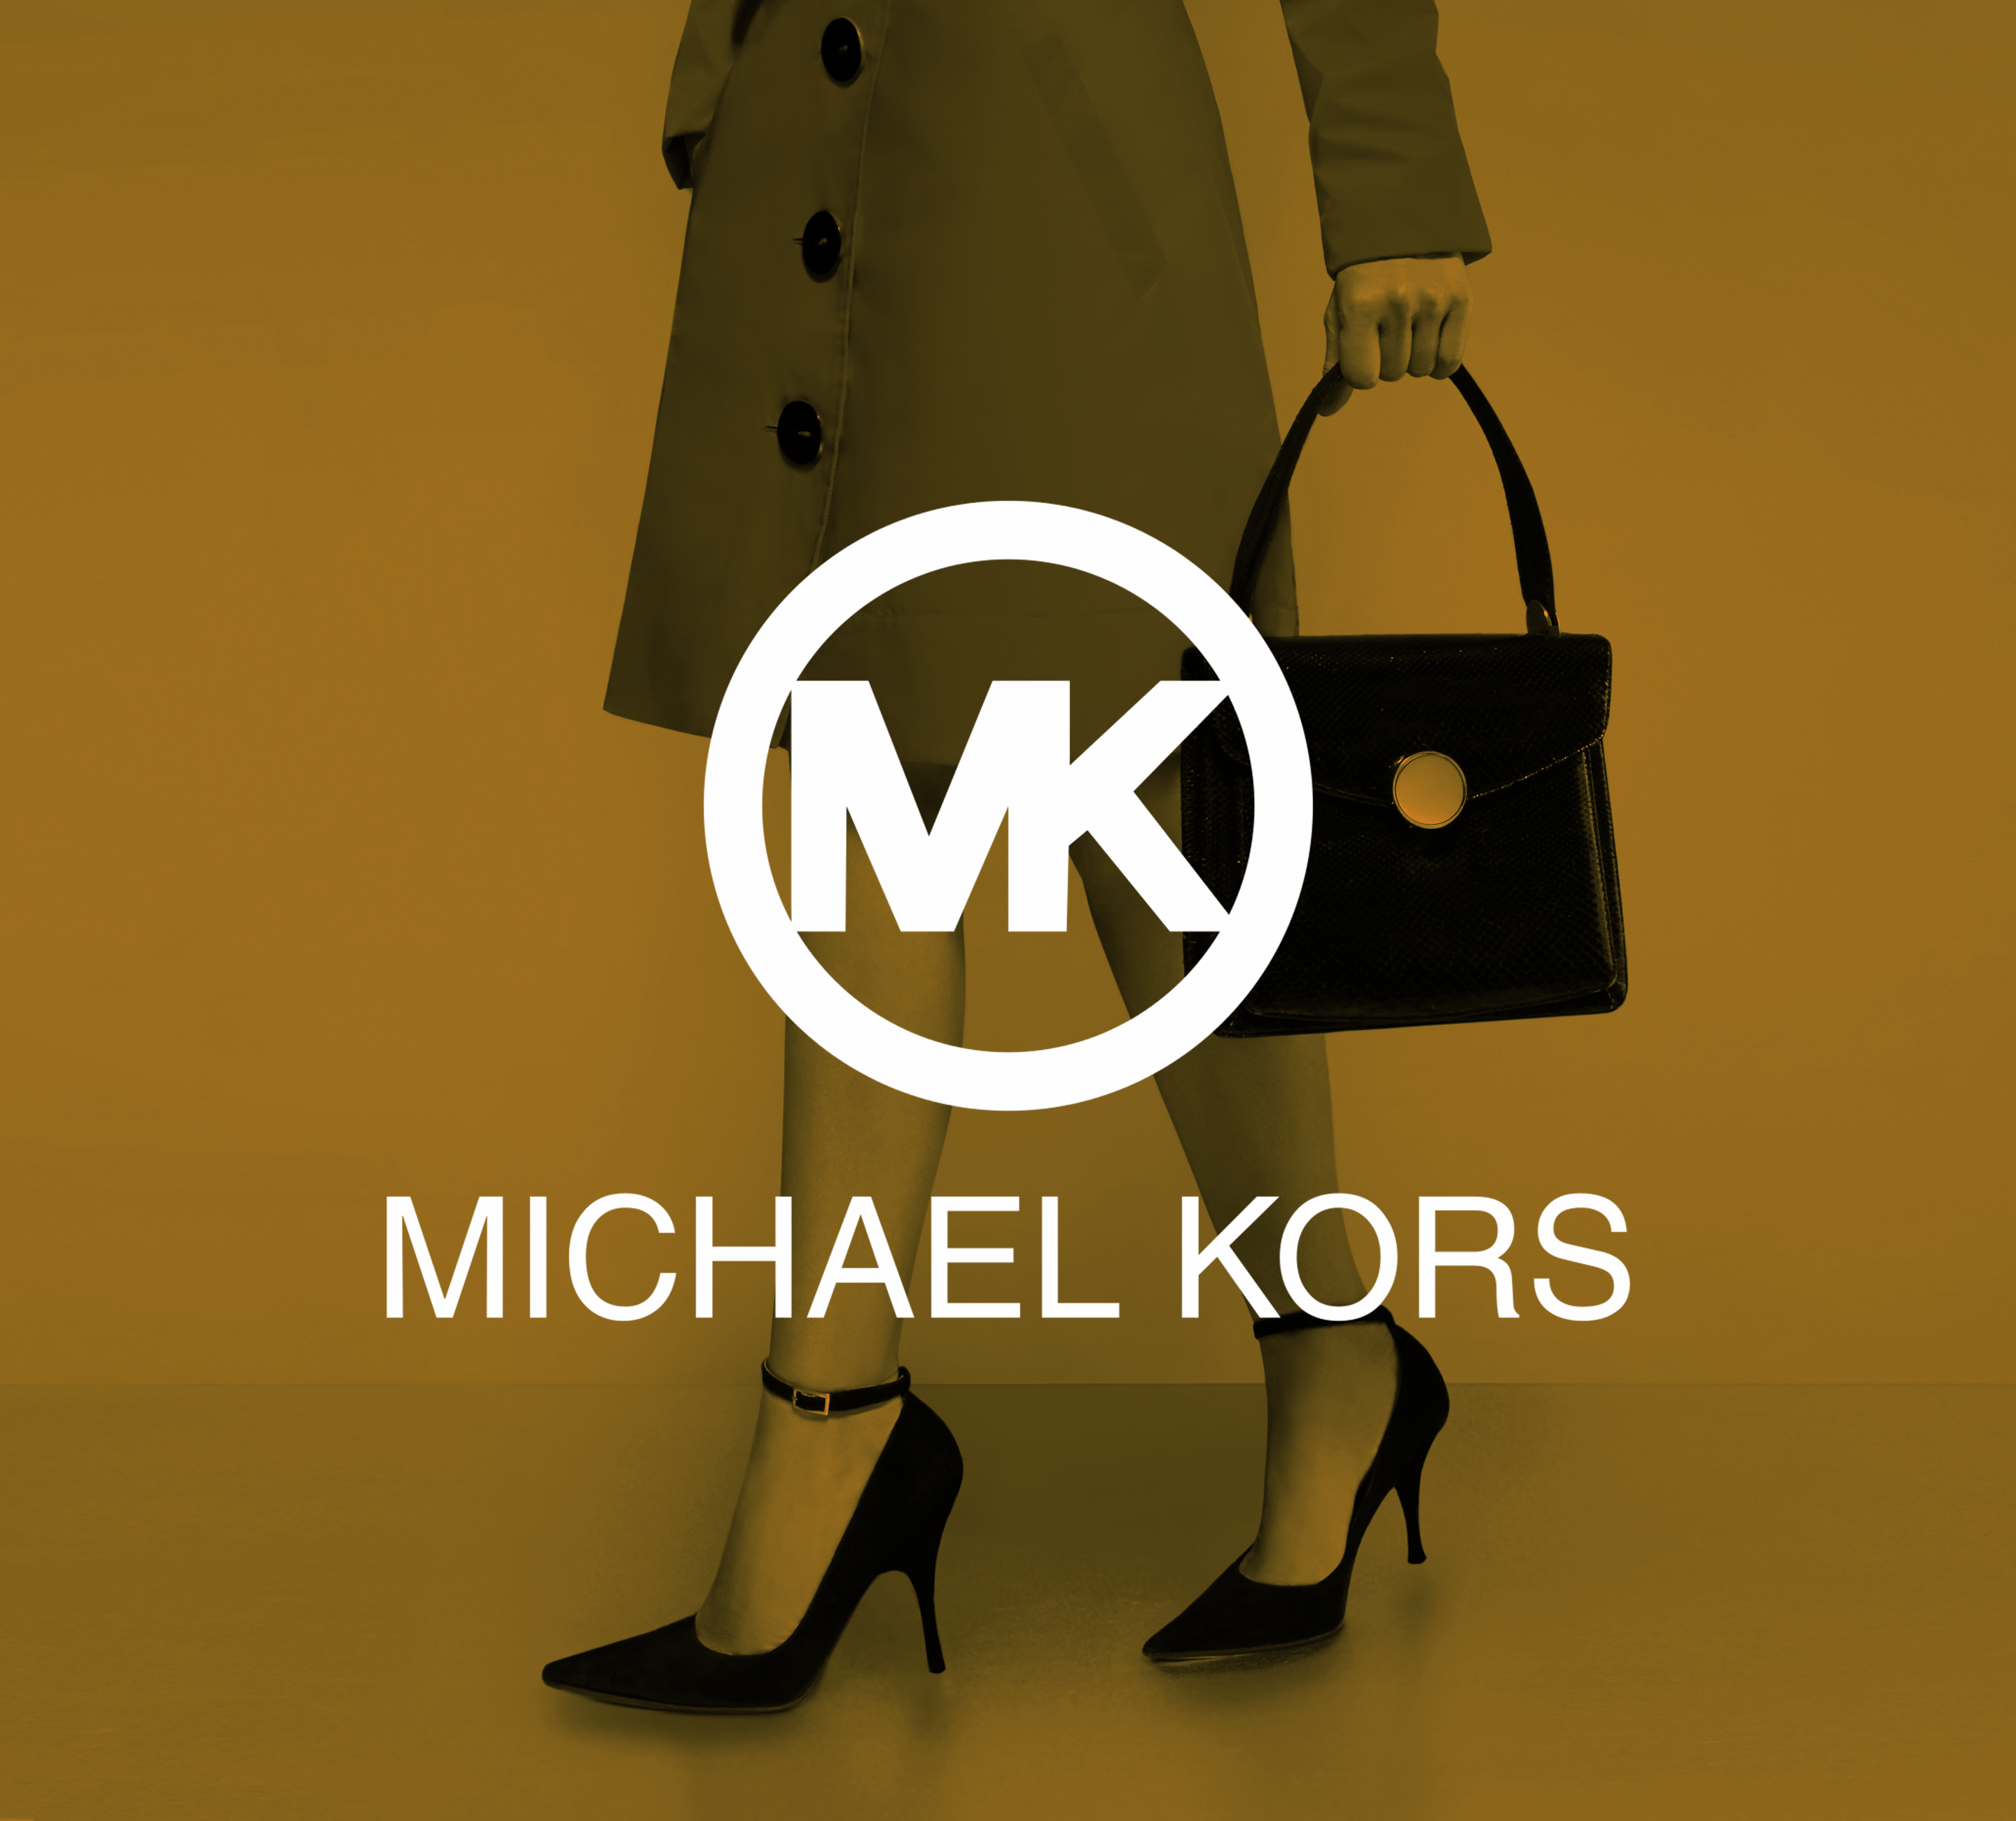 Michael_Kors_Photoshop_HQ.png